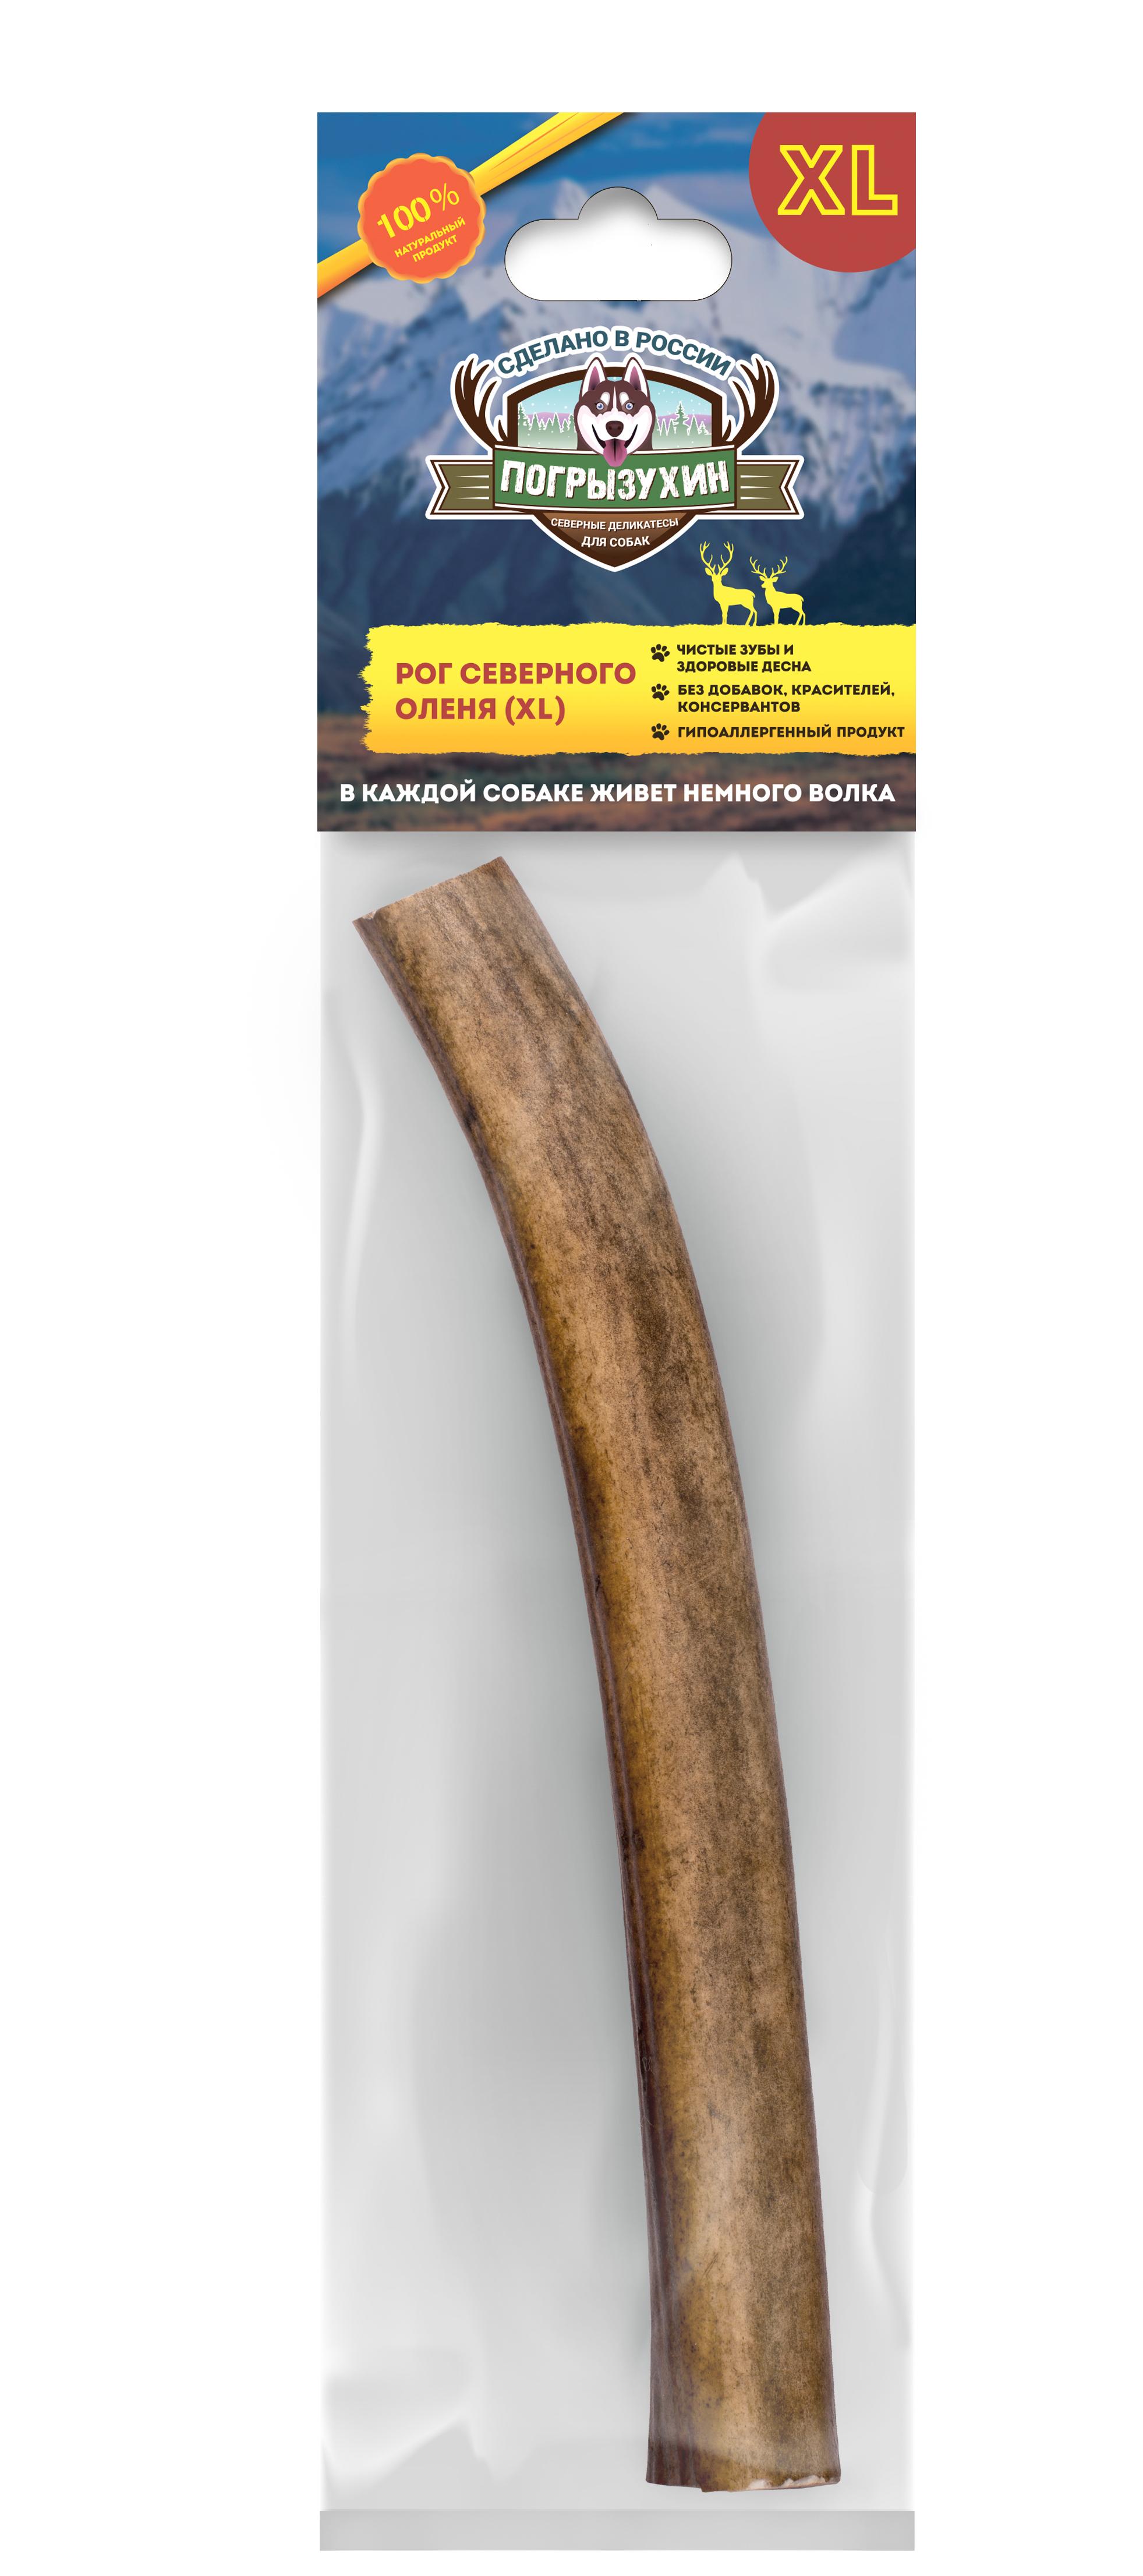 Лакомство для собак Погрызухин, рога оленя, размер ХL, 151-190г фото